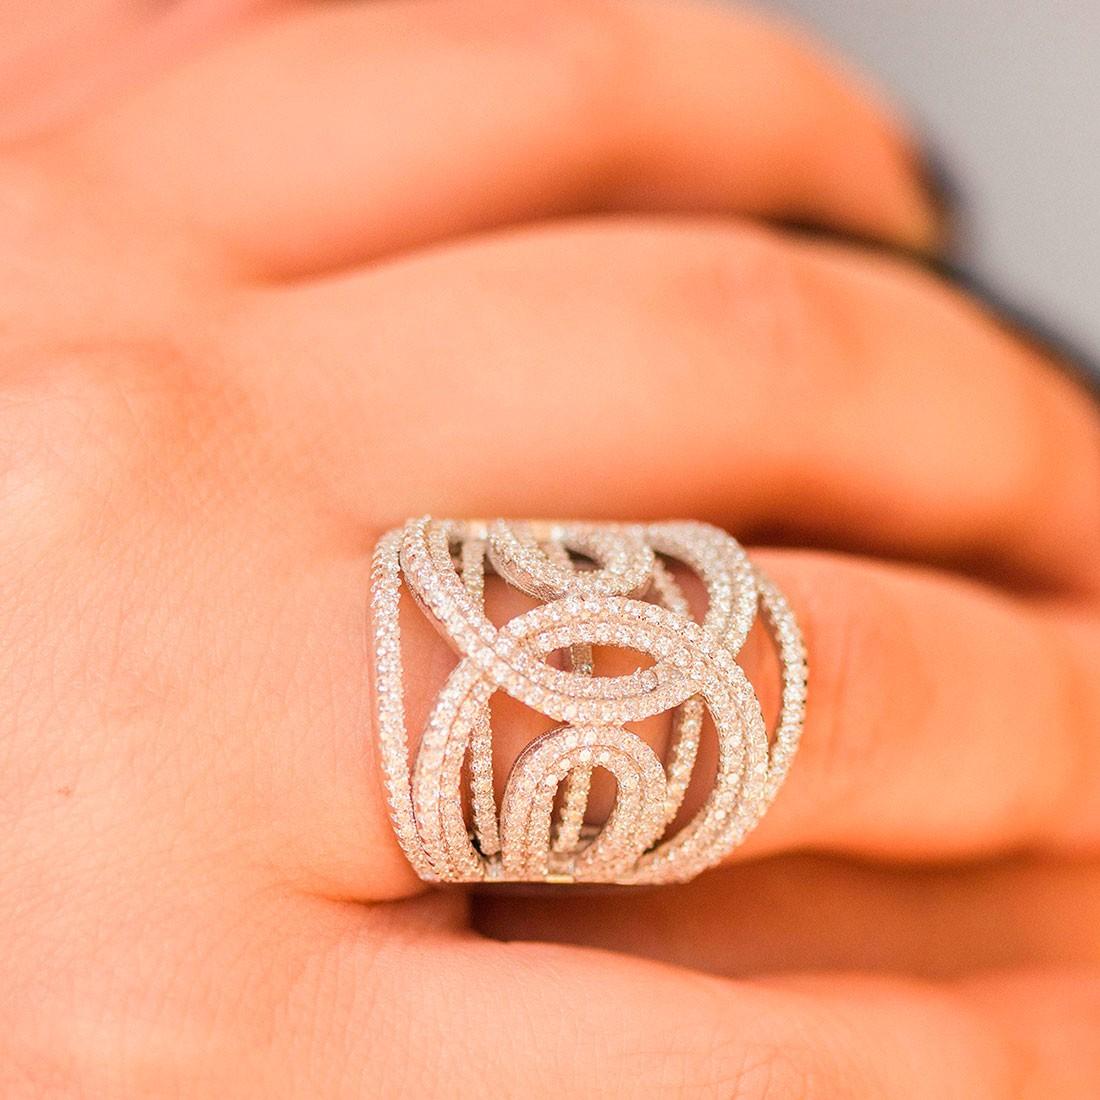 Kit de anel e brinco bordados de zircônias prata 925 com ródio branco feminino